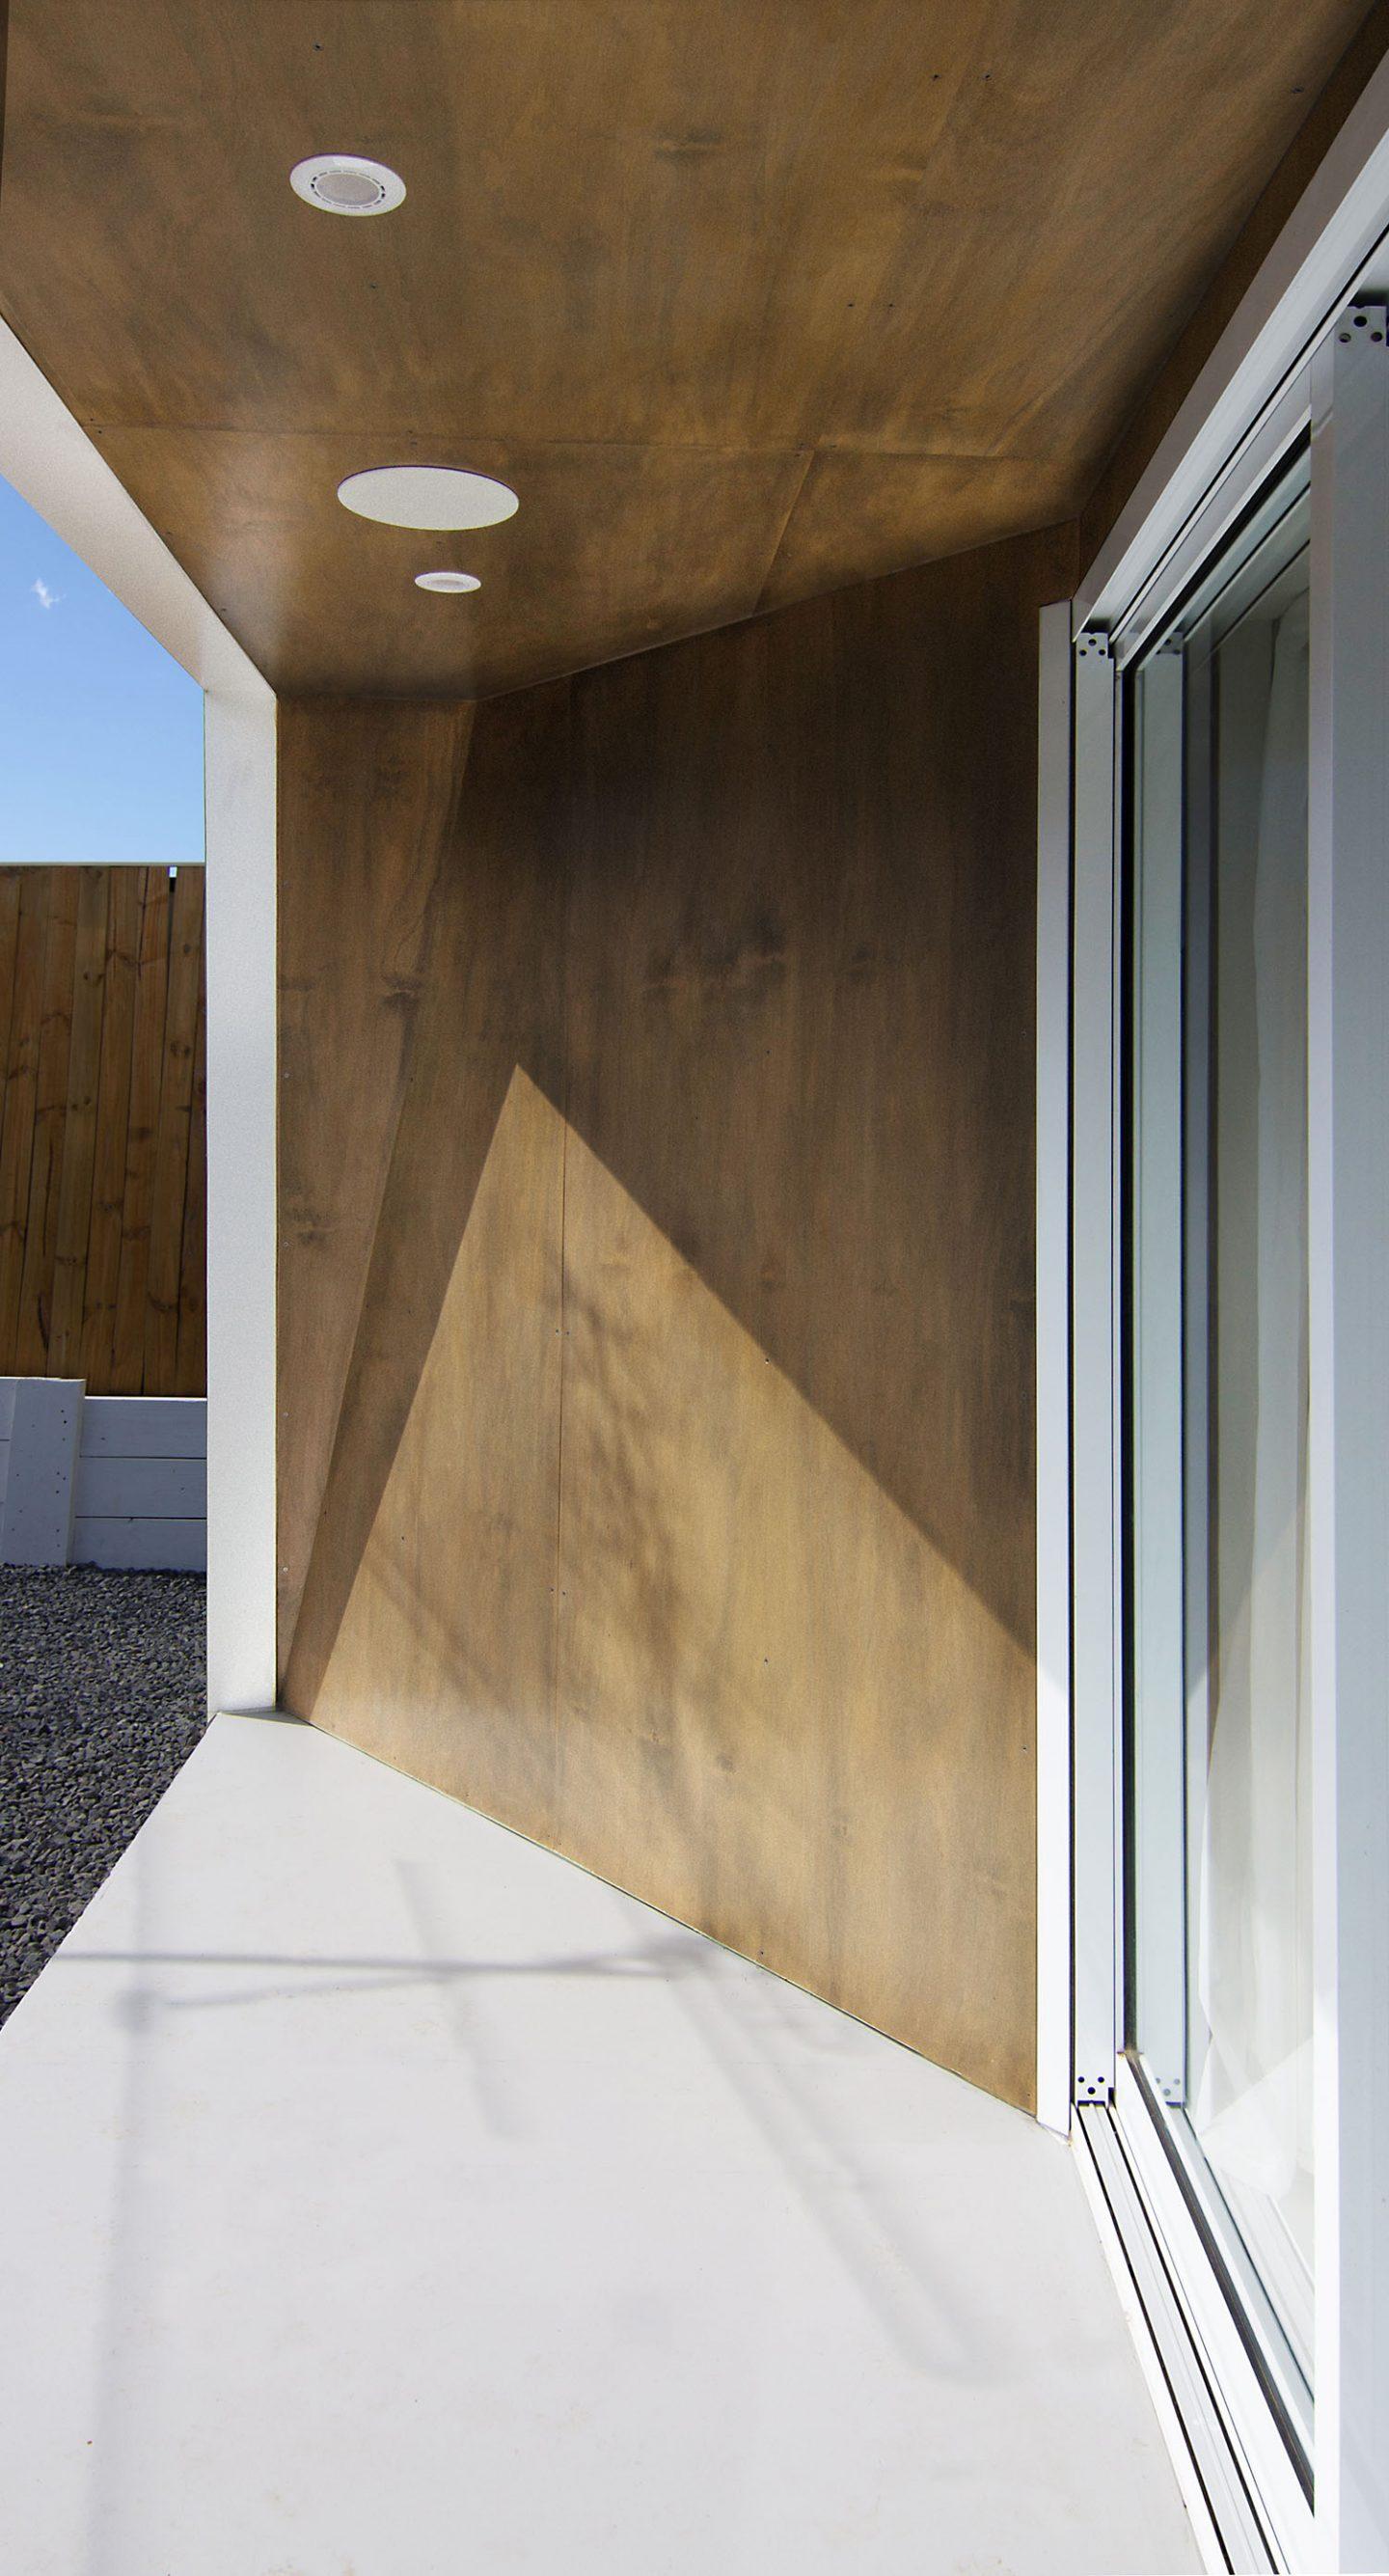 Architecture_House332_GrafikaArchitects_02